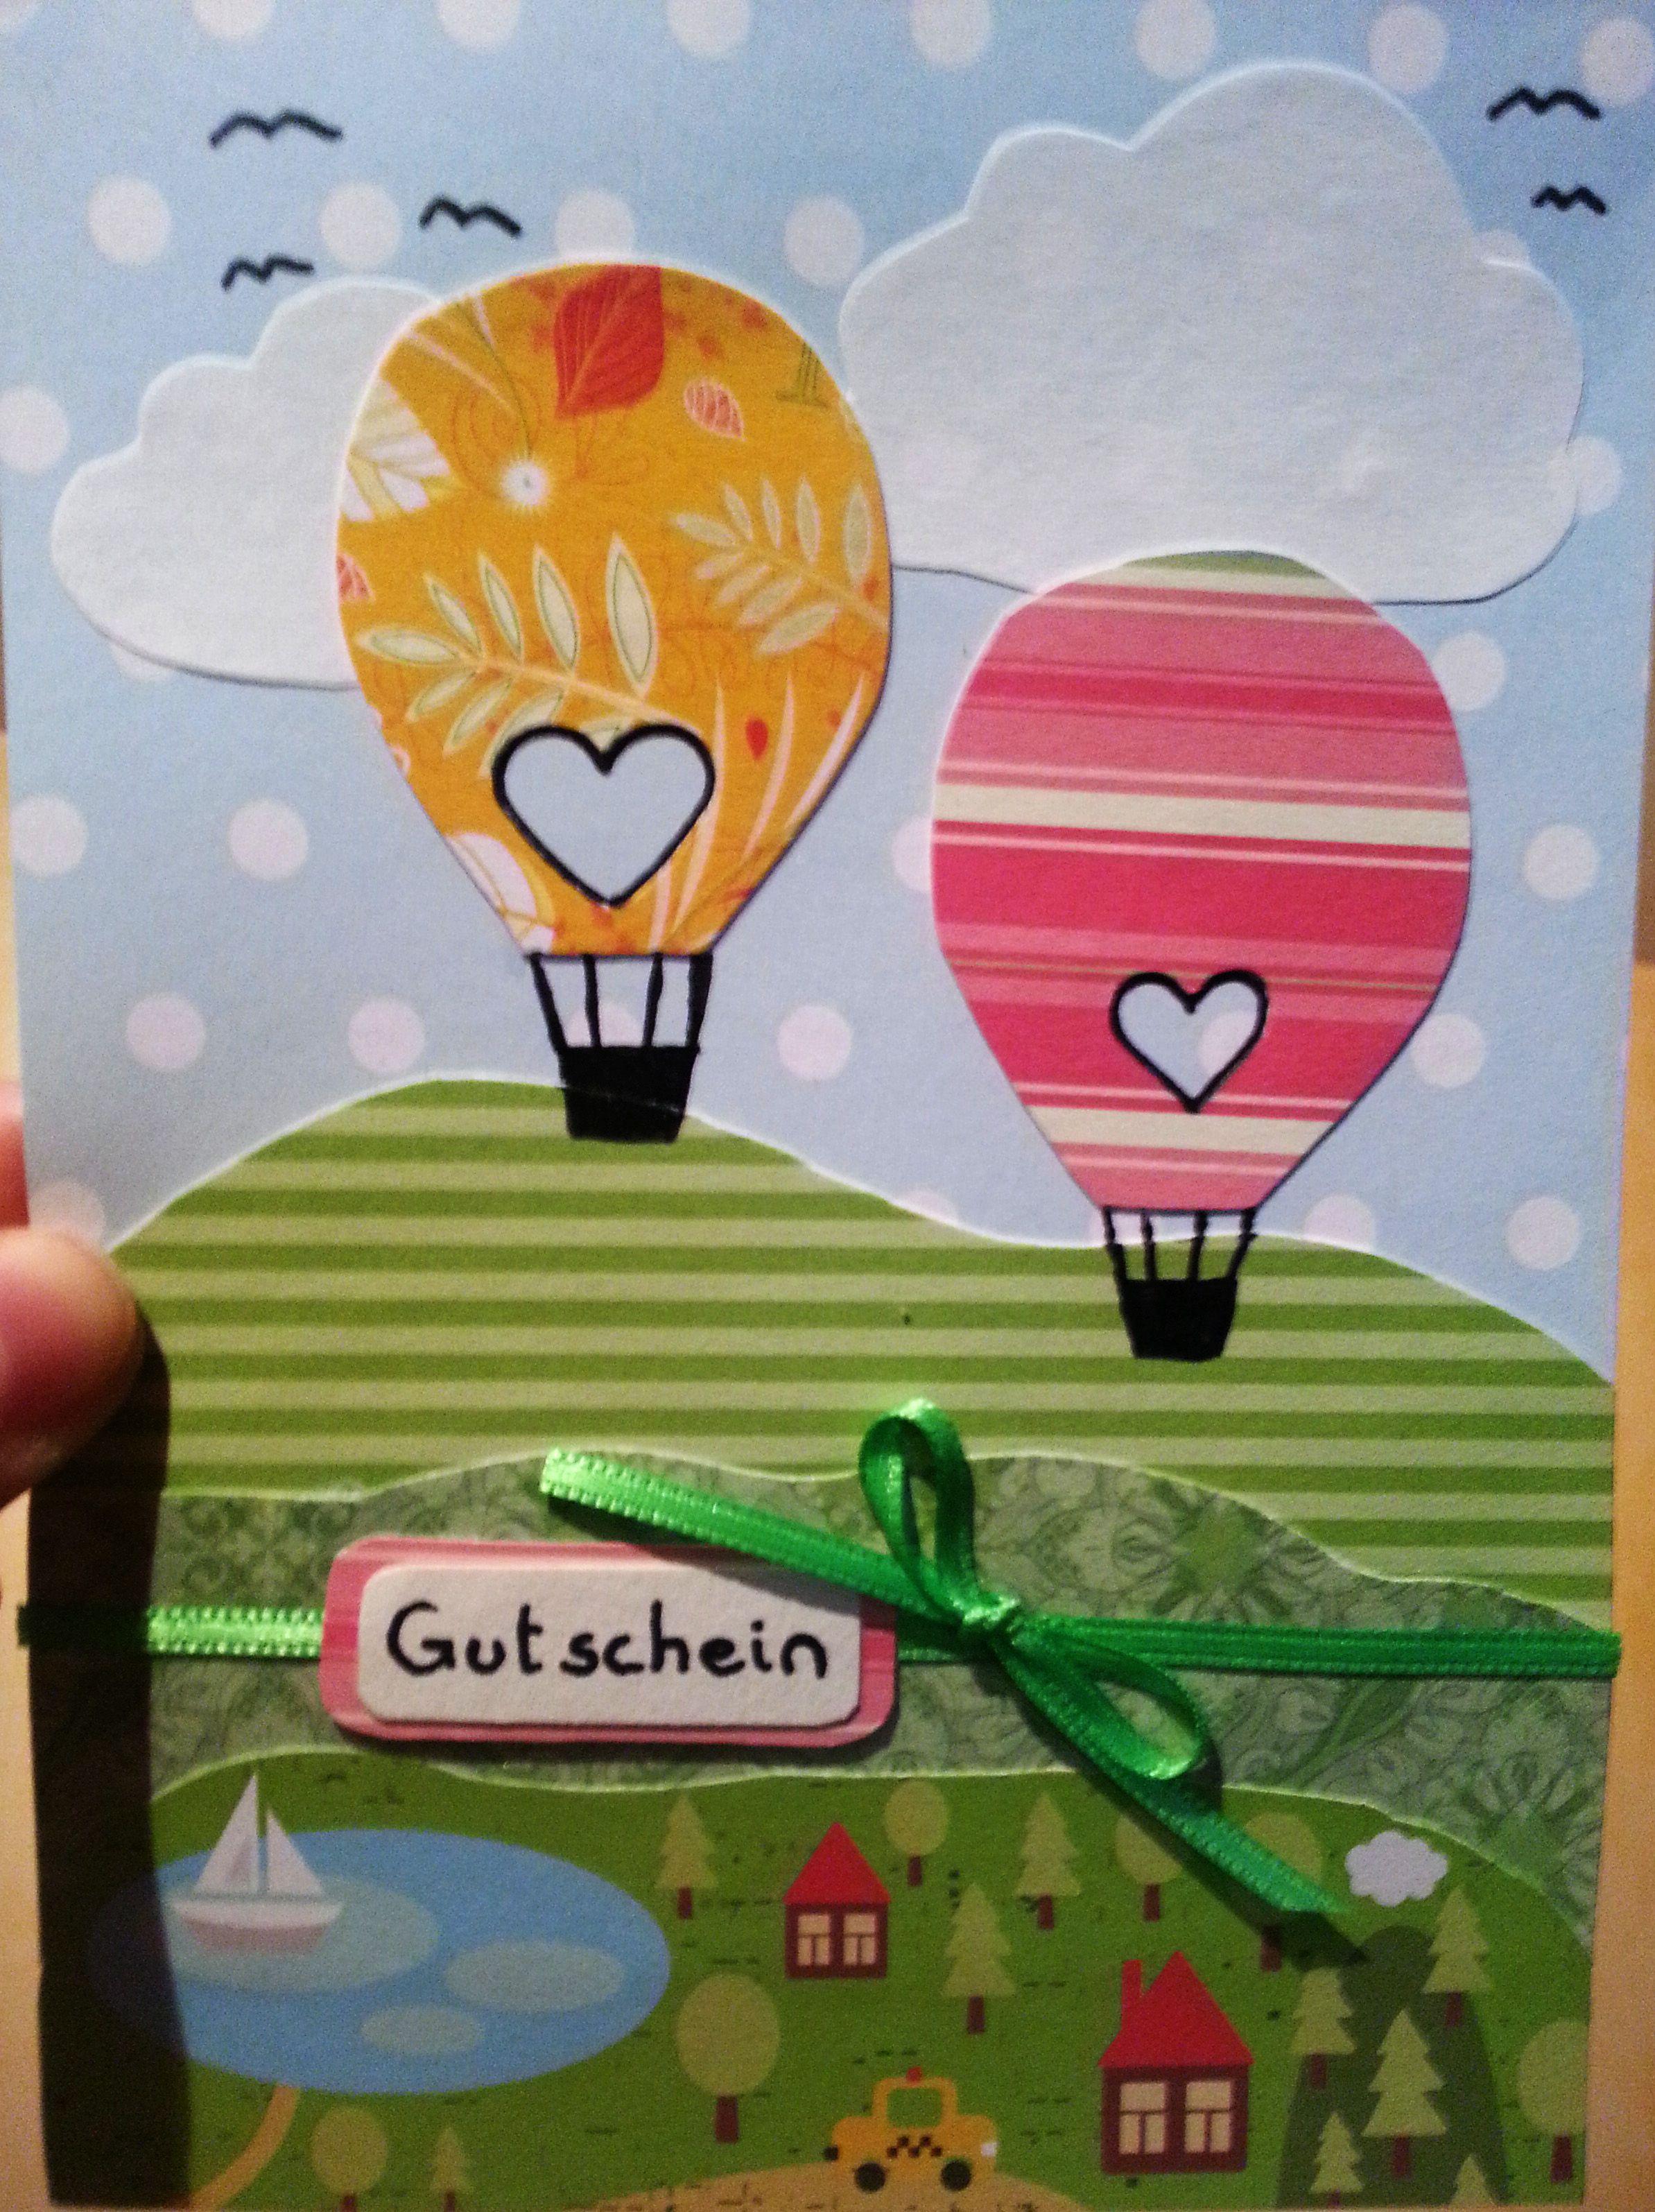 Selfmade Giftcard inspired by Krystal de Leeuw (http://krystalscardsandmore.blogspot.de/2012/02/14-days-of-love-day-9.html)